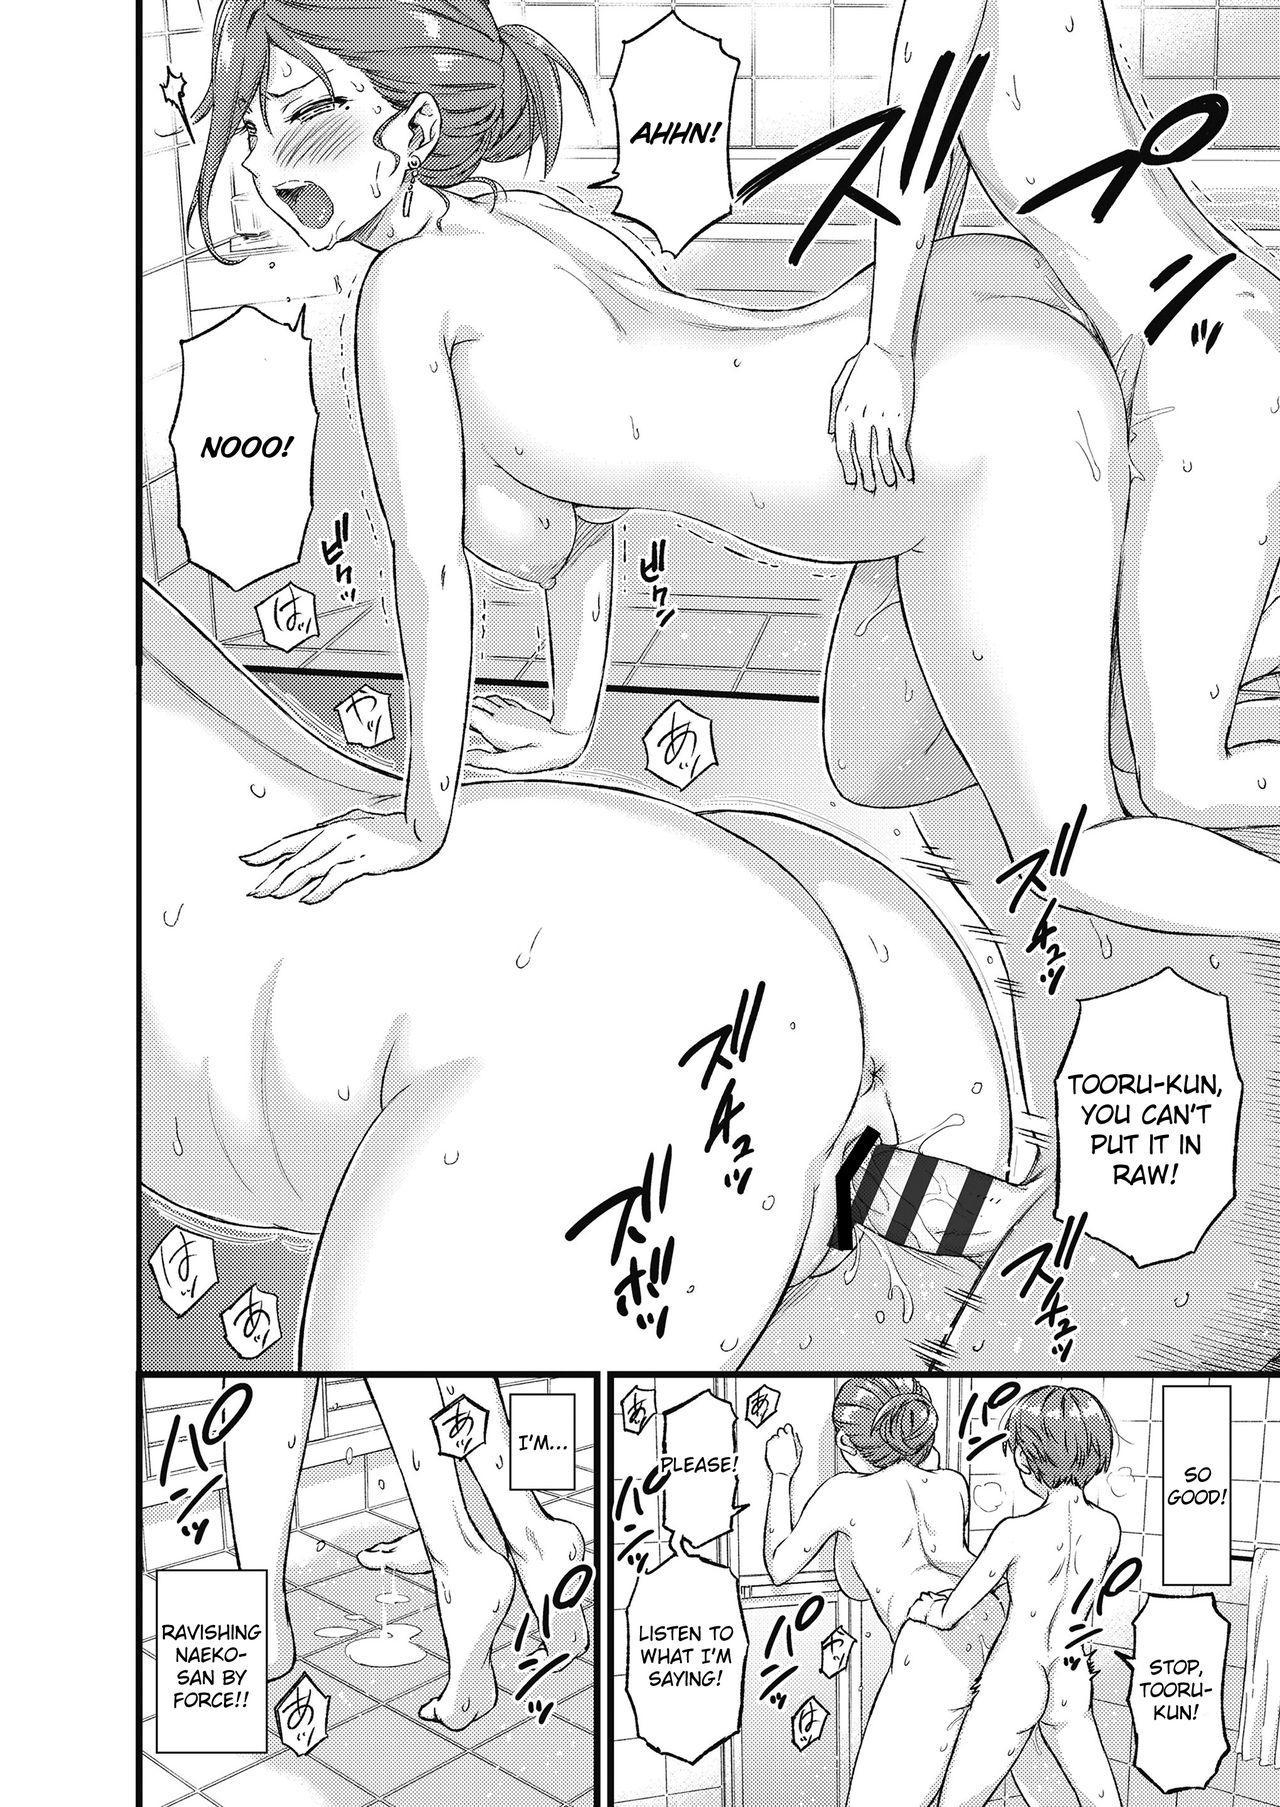 Oppai na Natsuyasumi | The Summer Break of Boobs 34